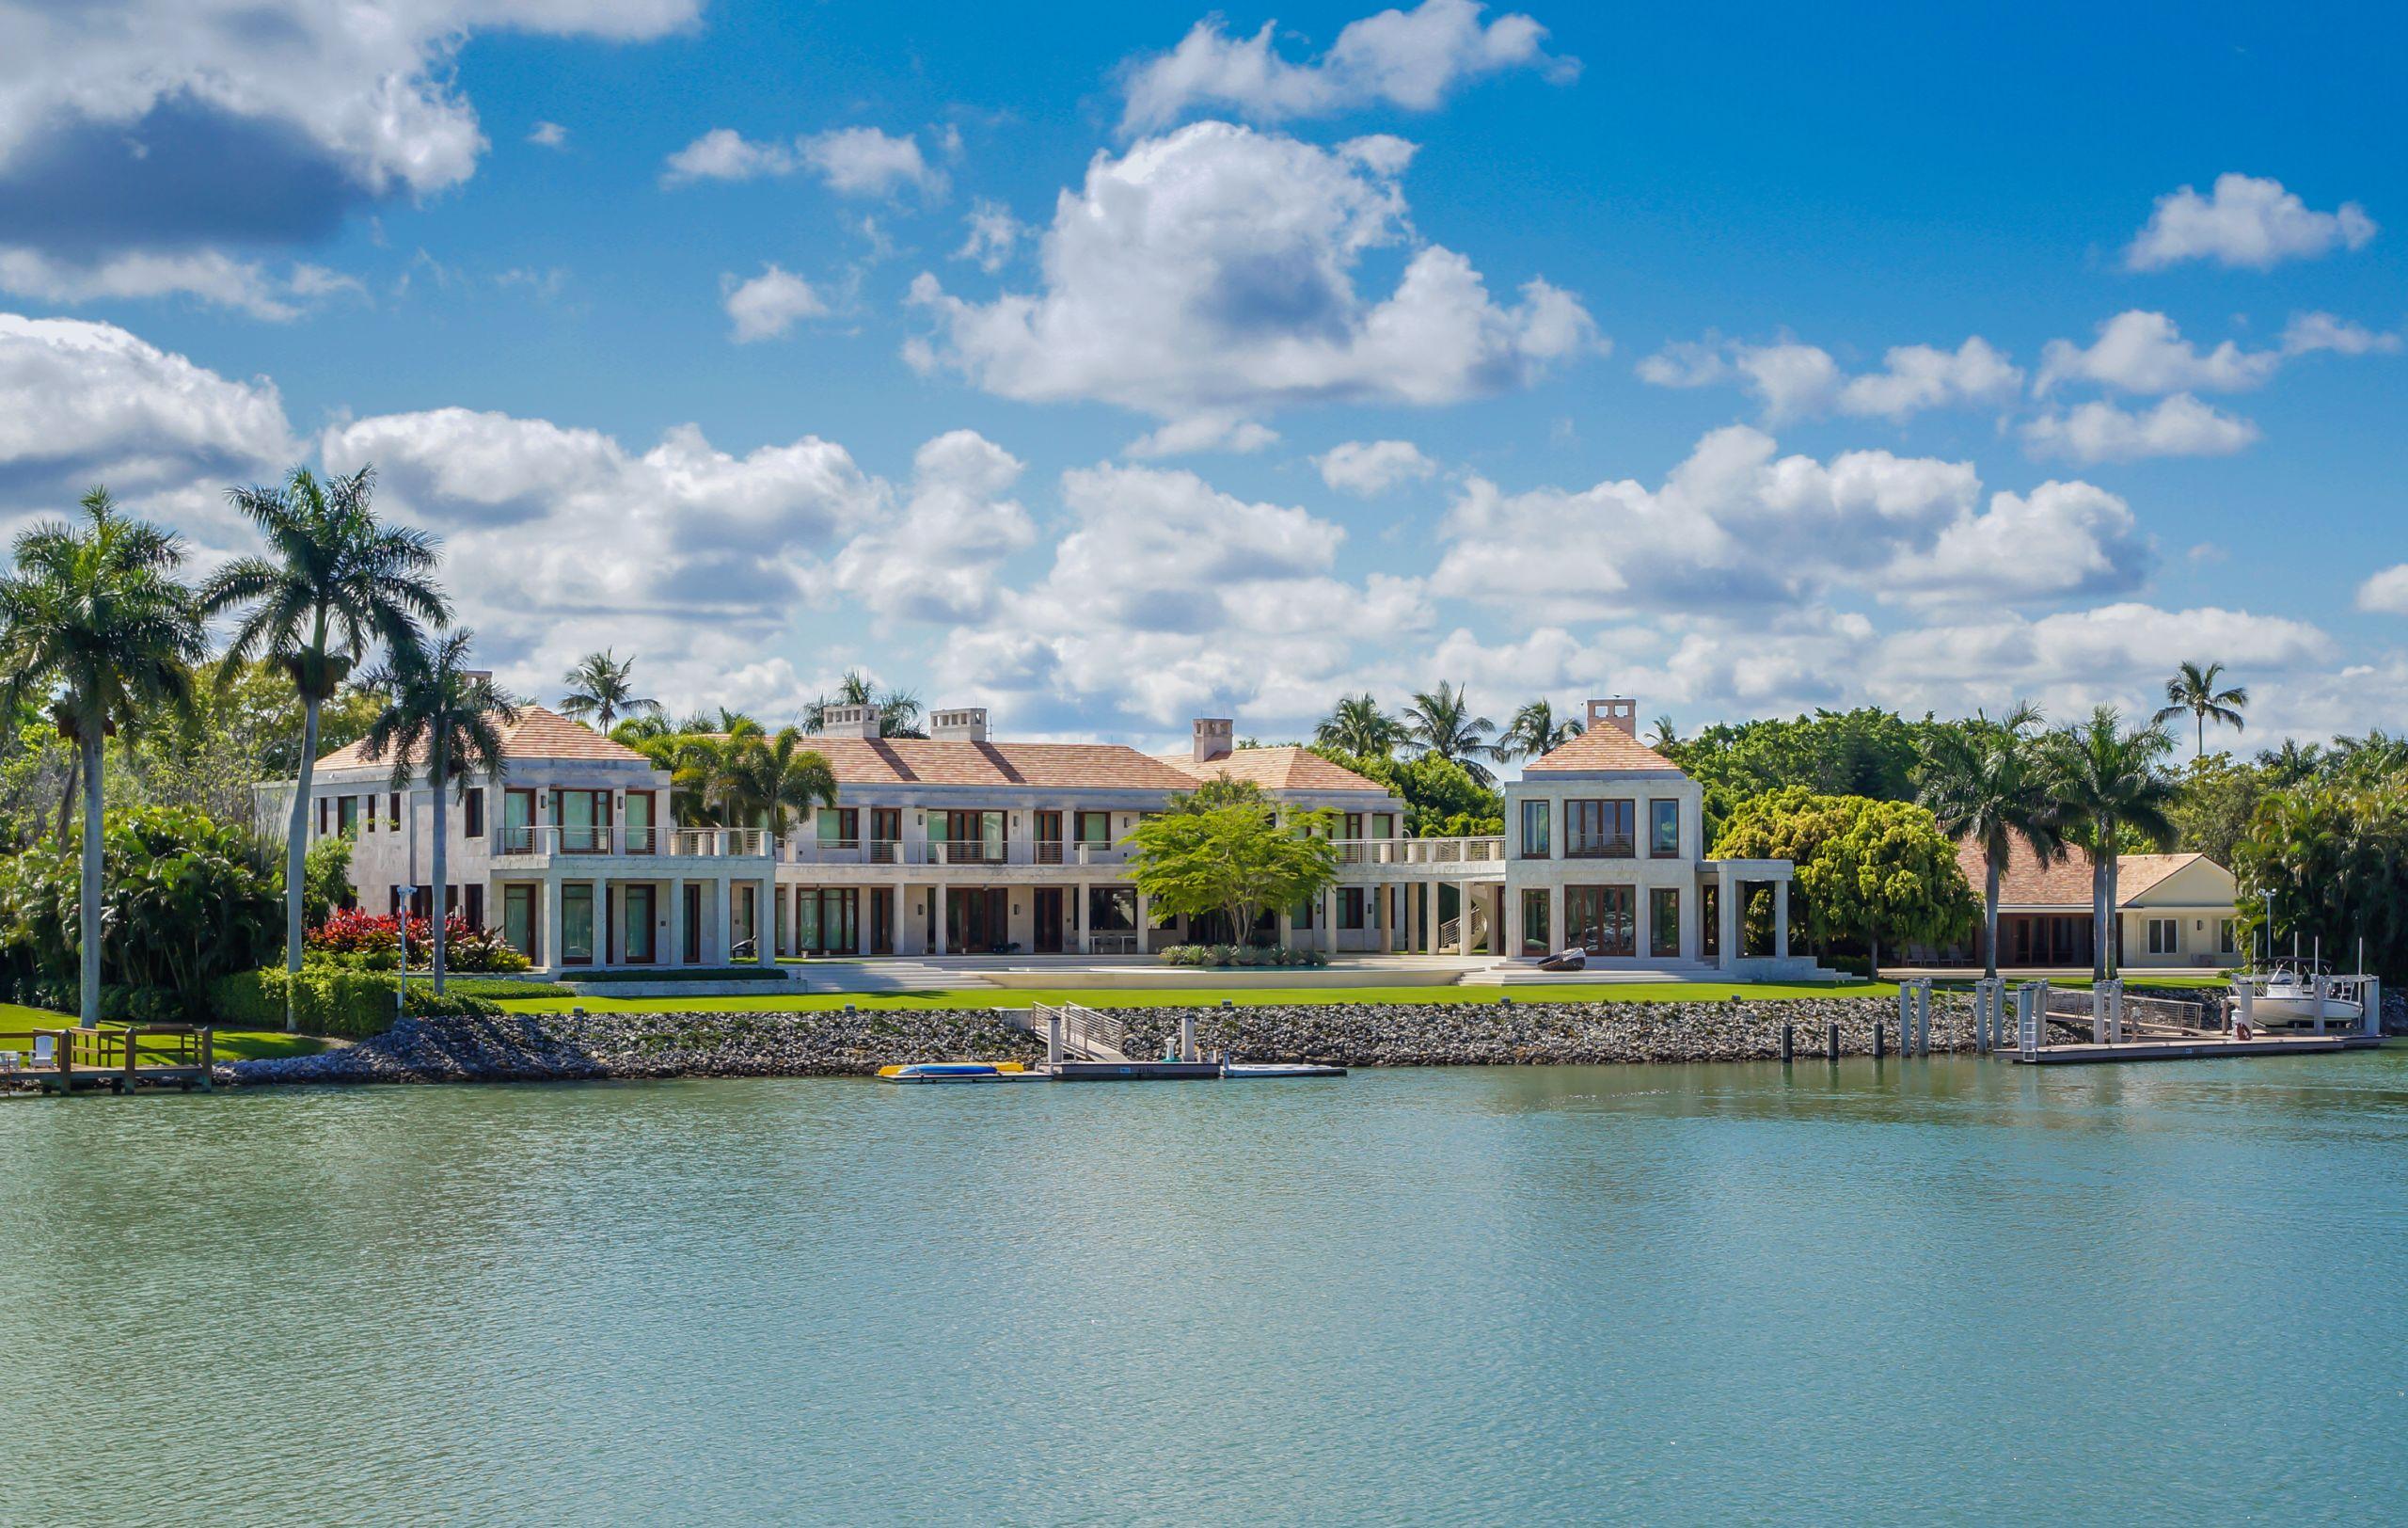 Moorings - Naples, Florida